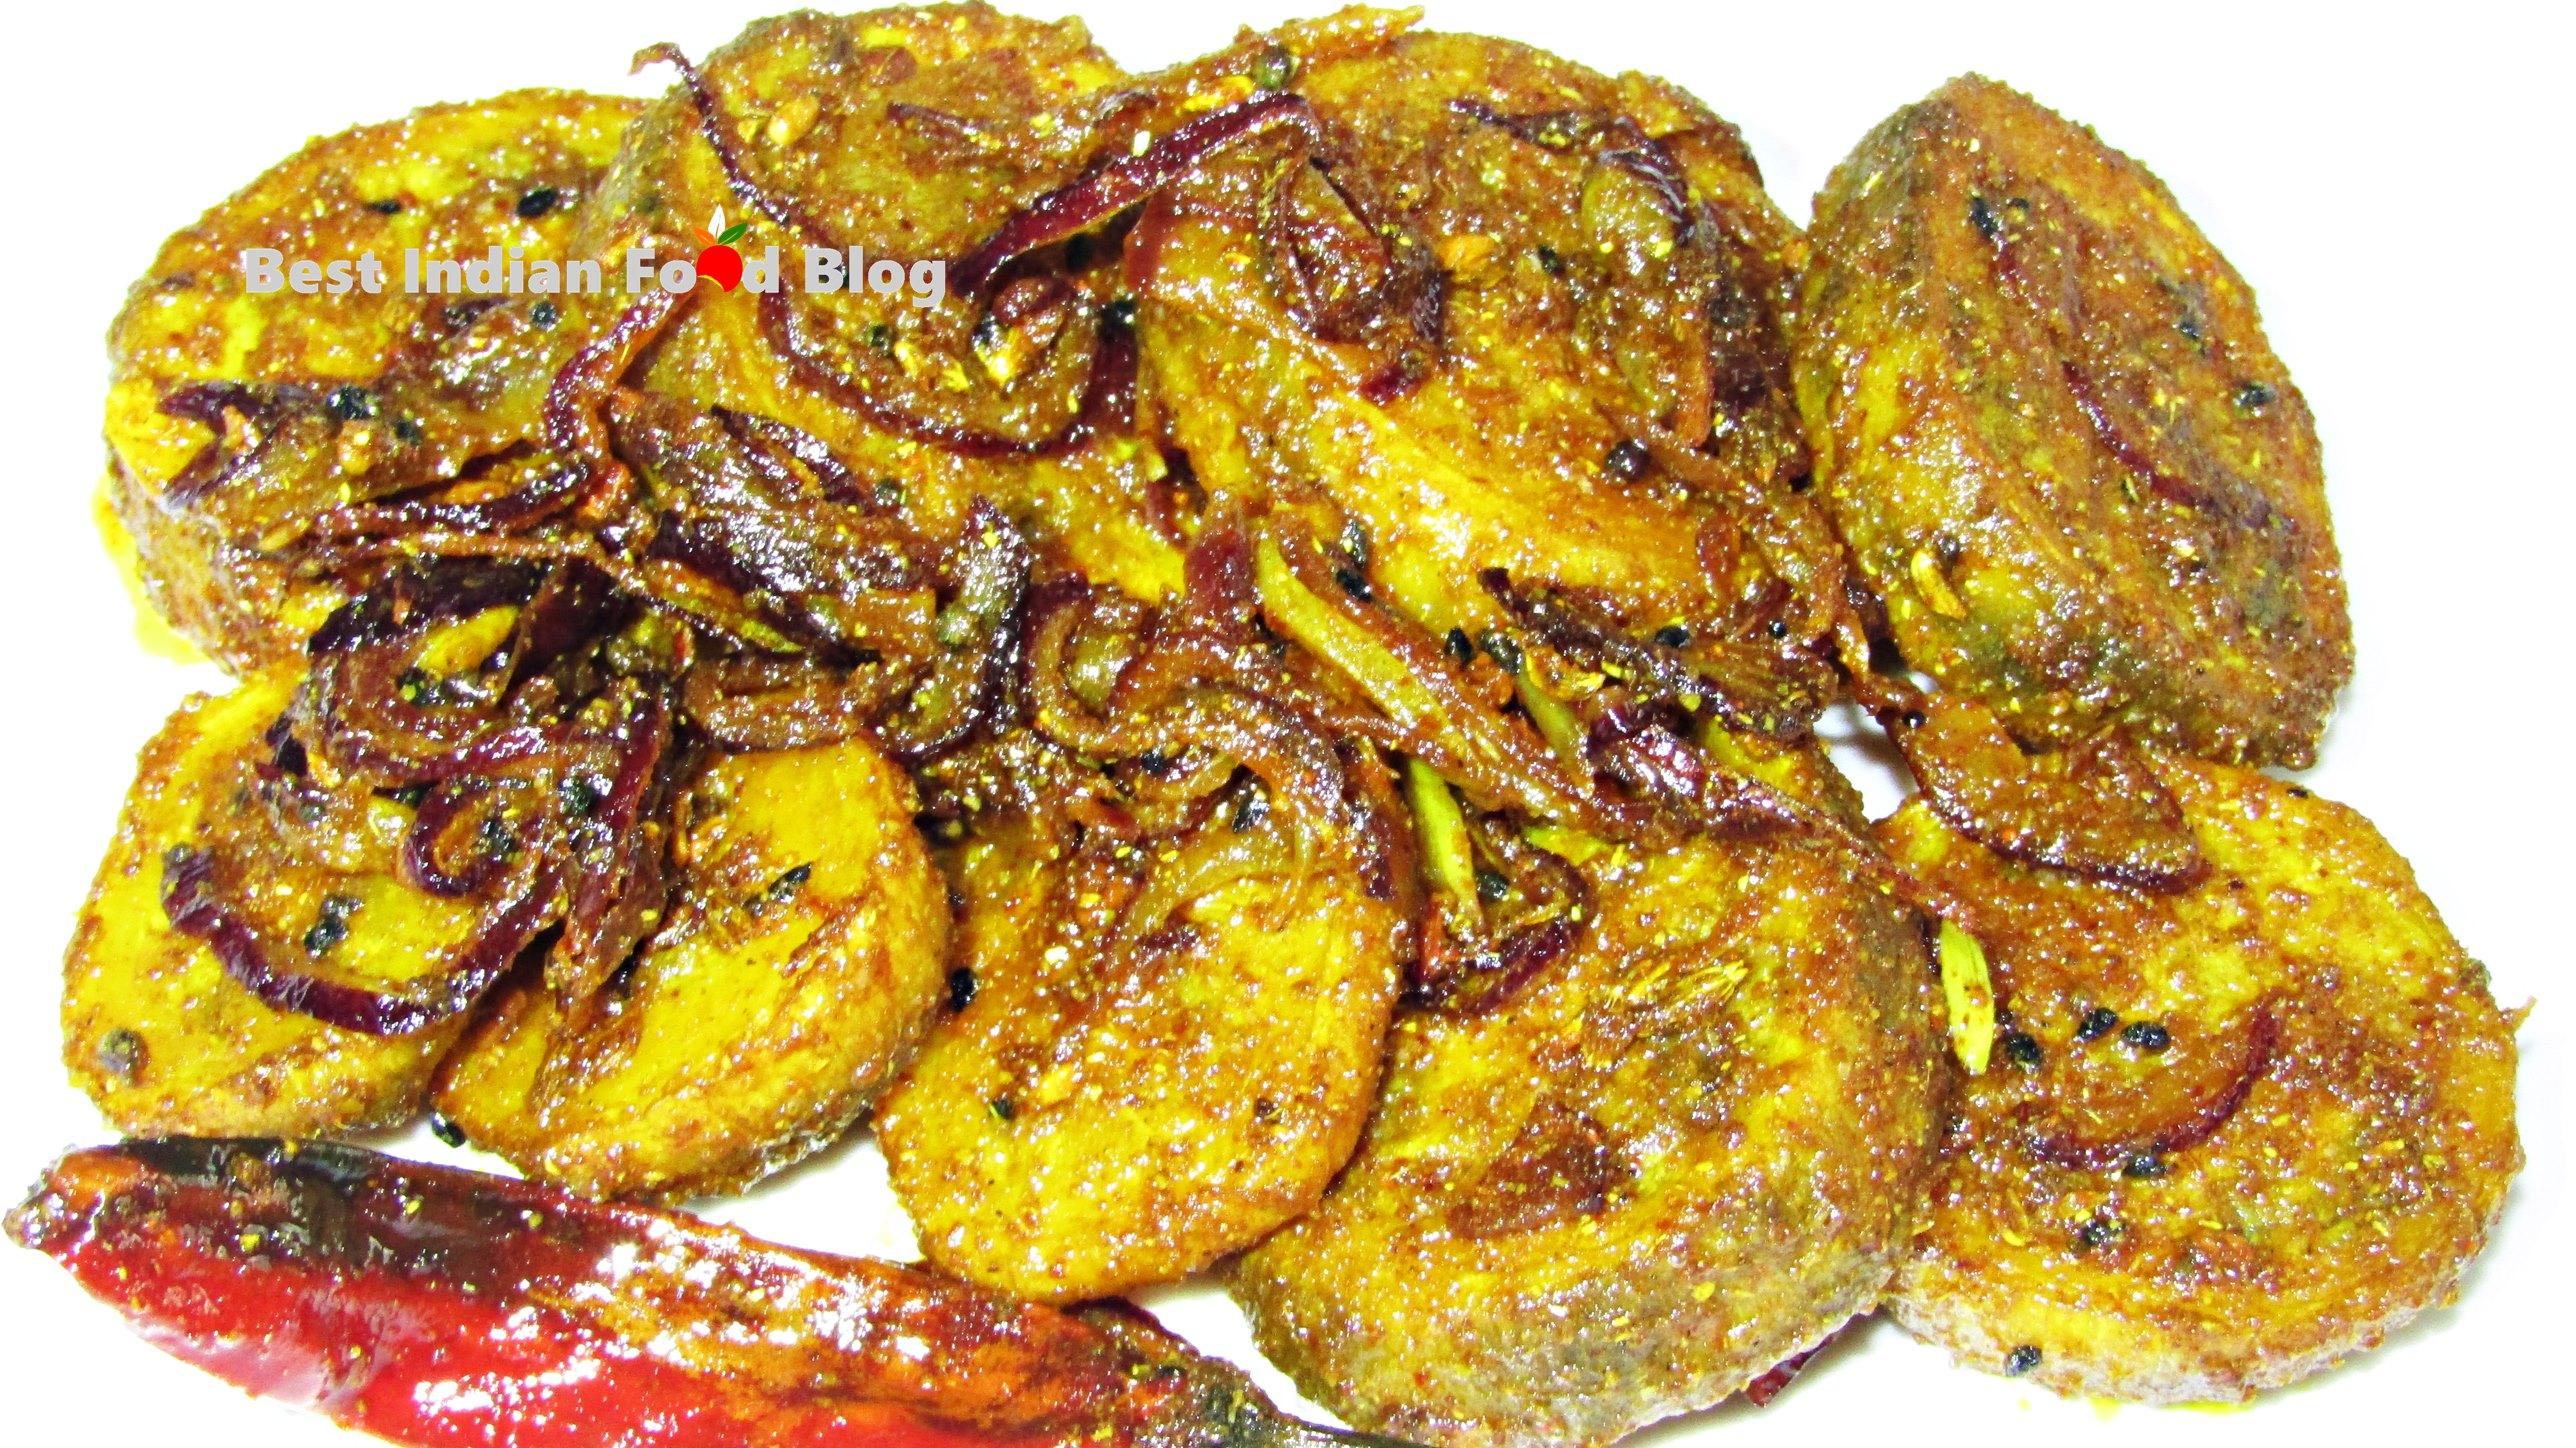 Kadali Bhaja from Odisha, India | Best Indian Food Blog